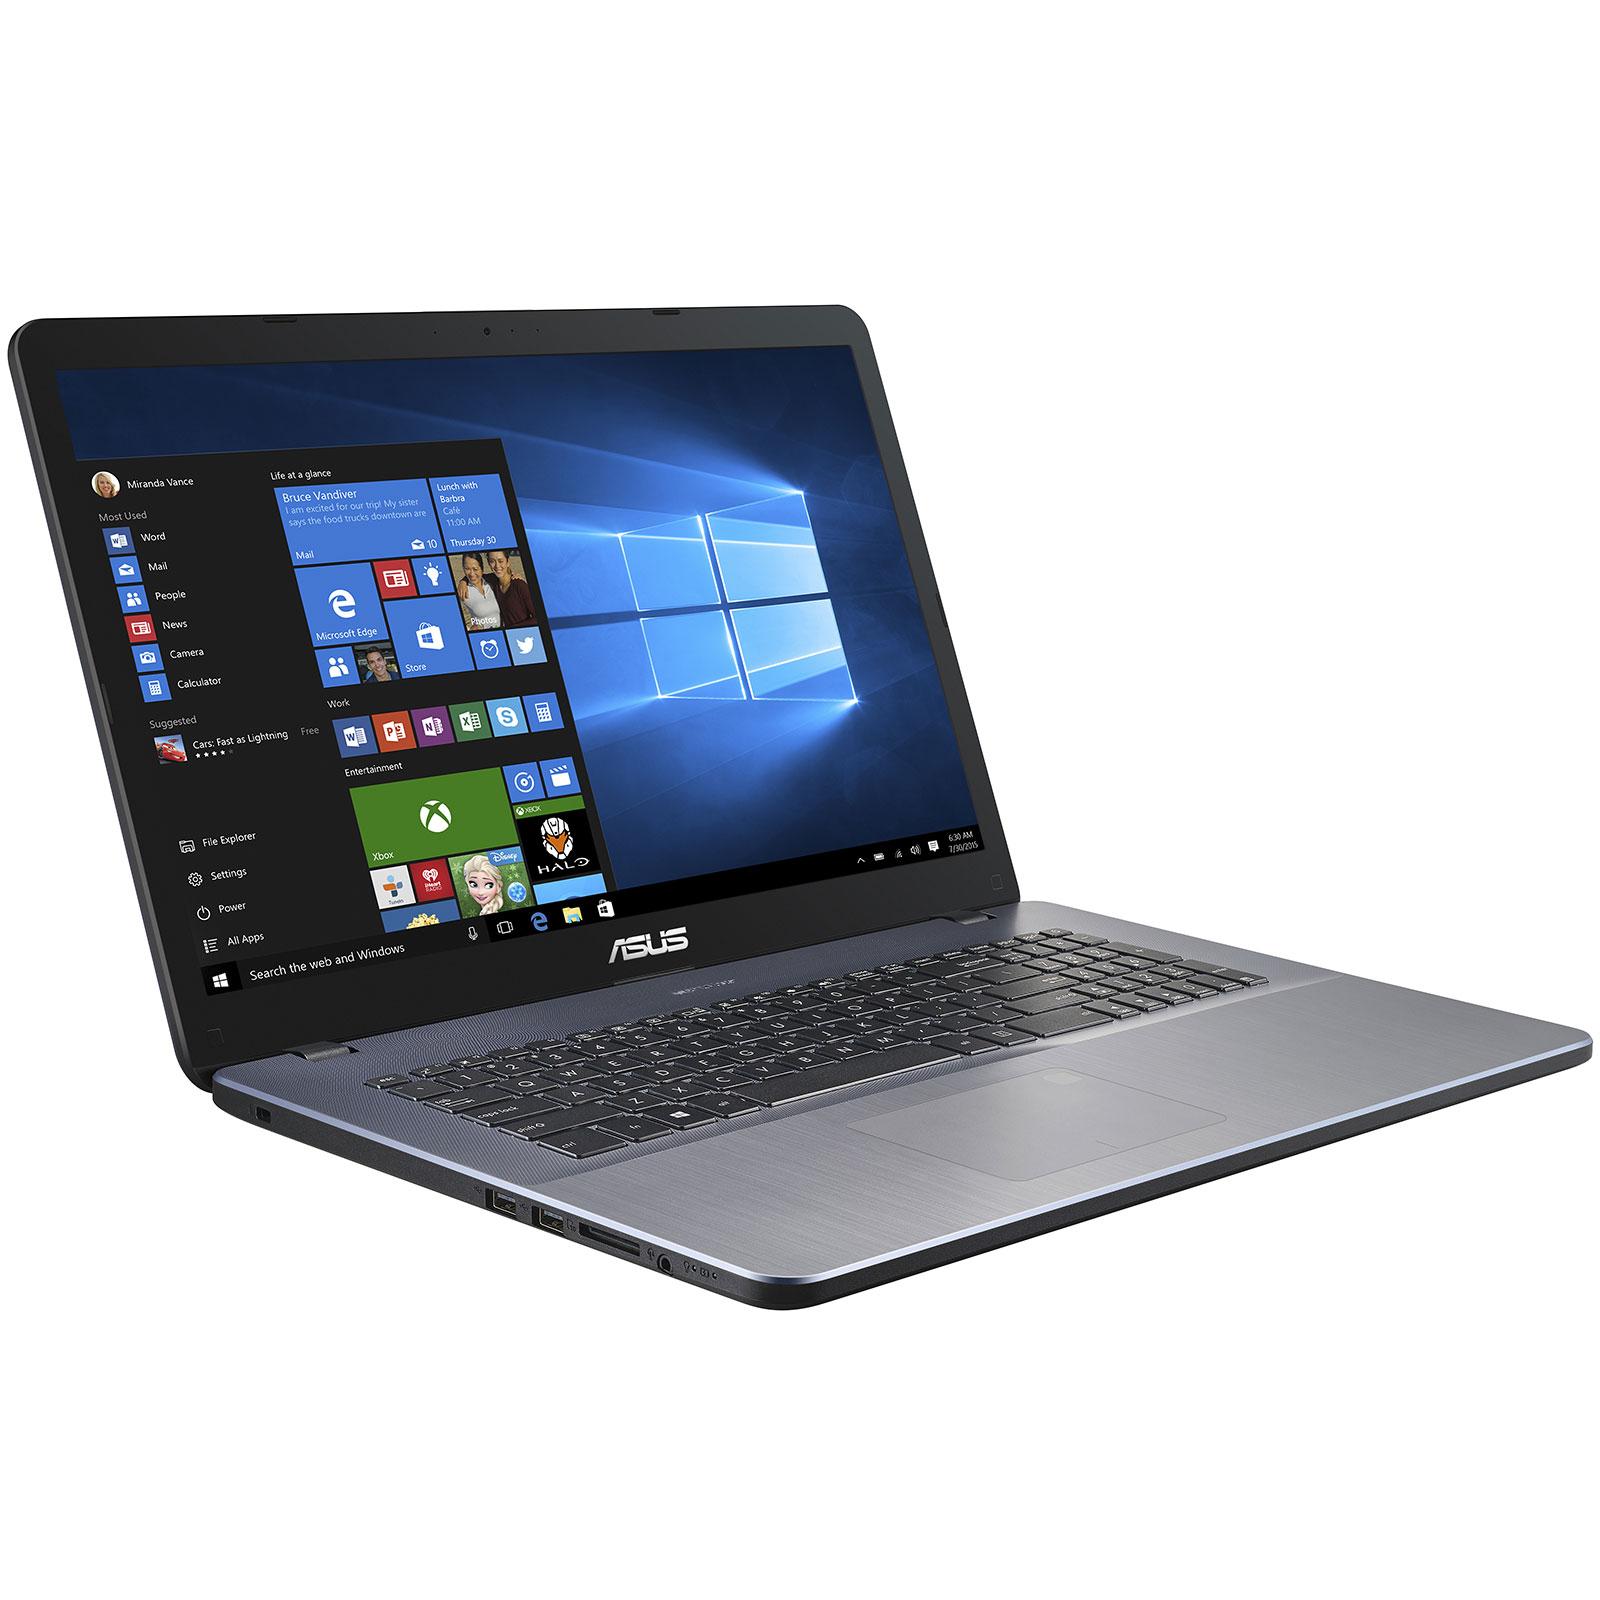 "PC portable ASUS P1700UA-BX286R Intel Core i3-7100U 4 Go 500 Go 17.3"" LED HD+ Wi-Fi AC/Bluetooth Webcam Windows 10 Professionnel 64 bits (garantie constructeur 2 ans)"